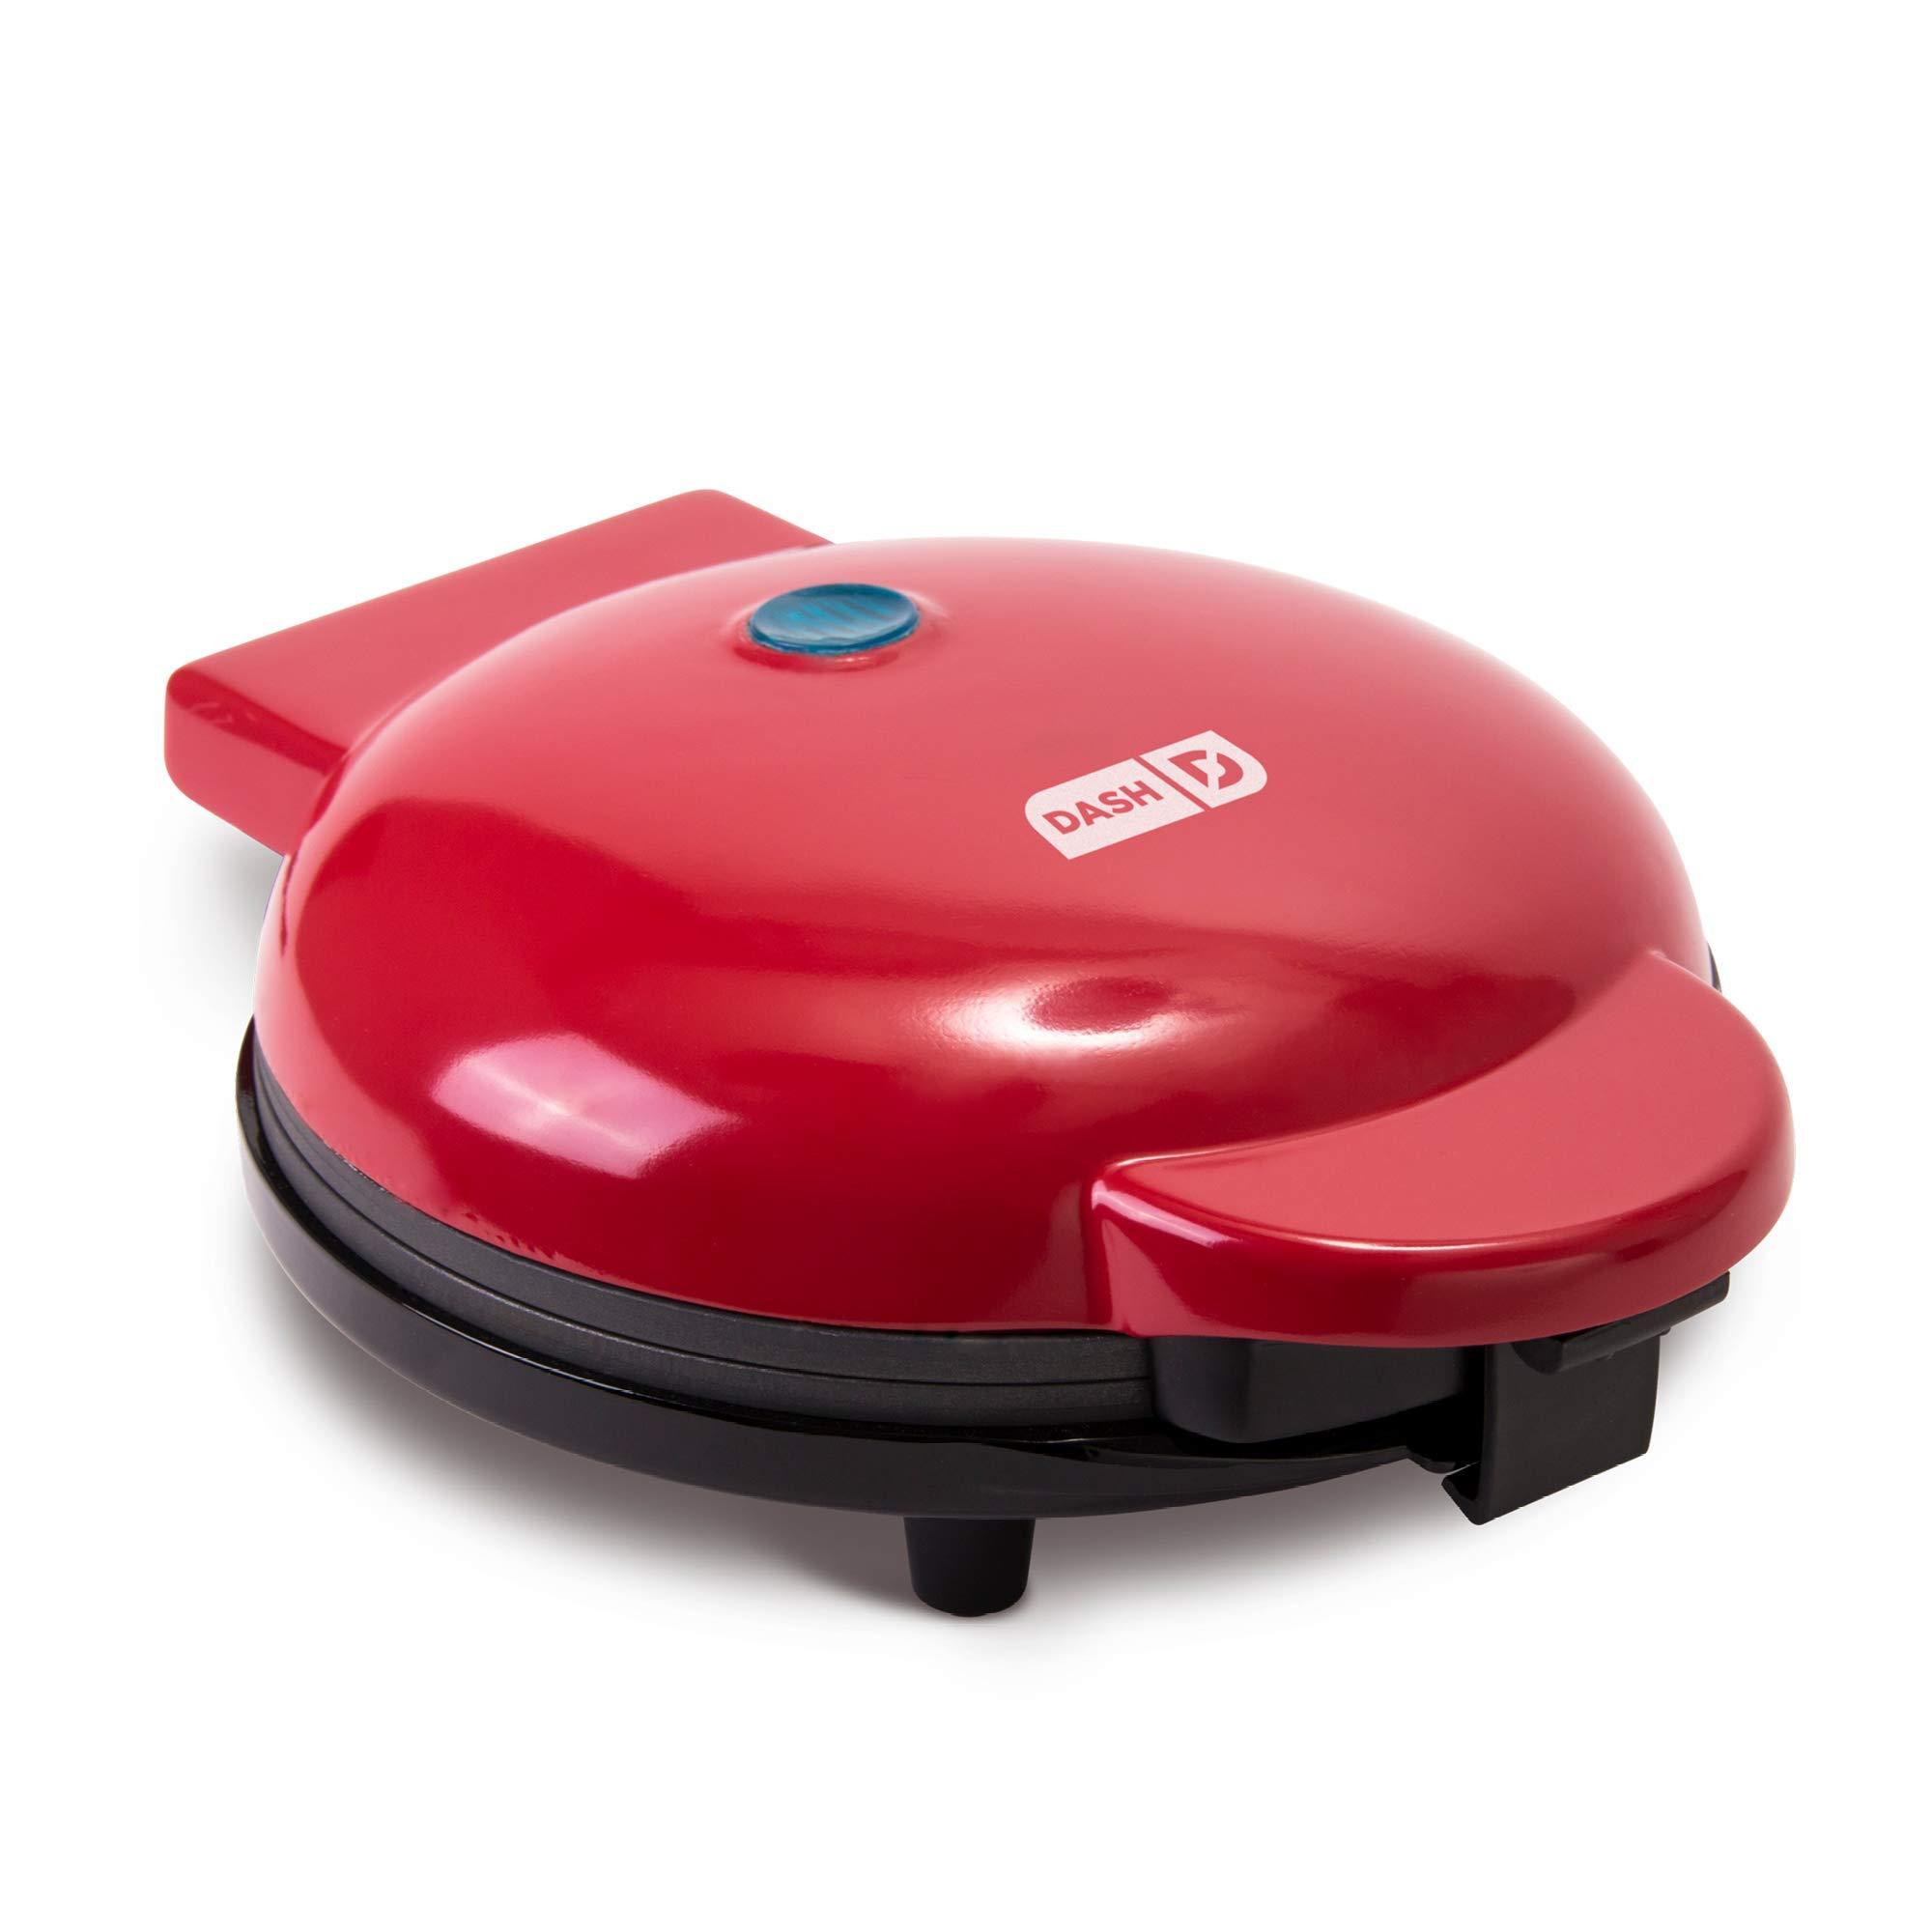 "Dash DEWM8100RD Express 8"" Waffle Maker Machine for Indivi"